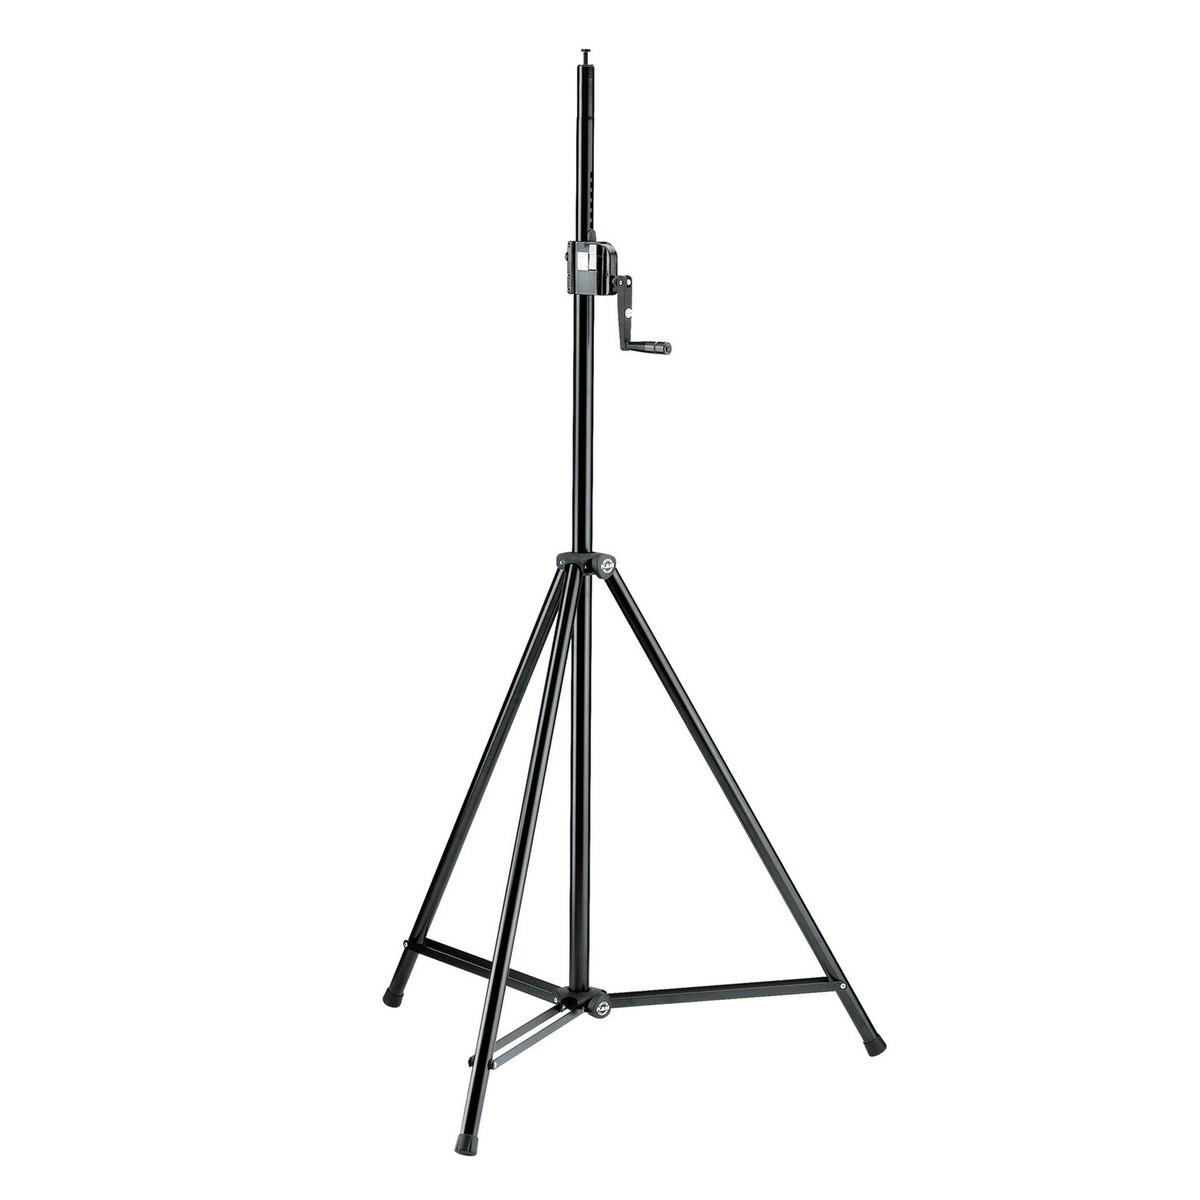 K M Lighting Chittagong: K&M 246/1 Lighting/Speaker Stand, Black At Gear4music